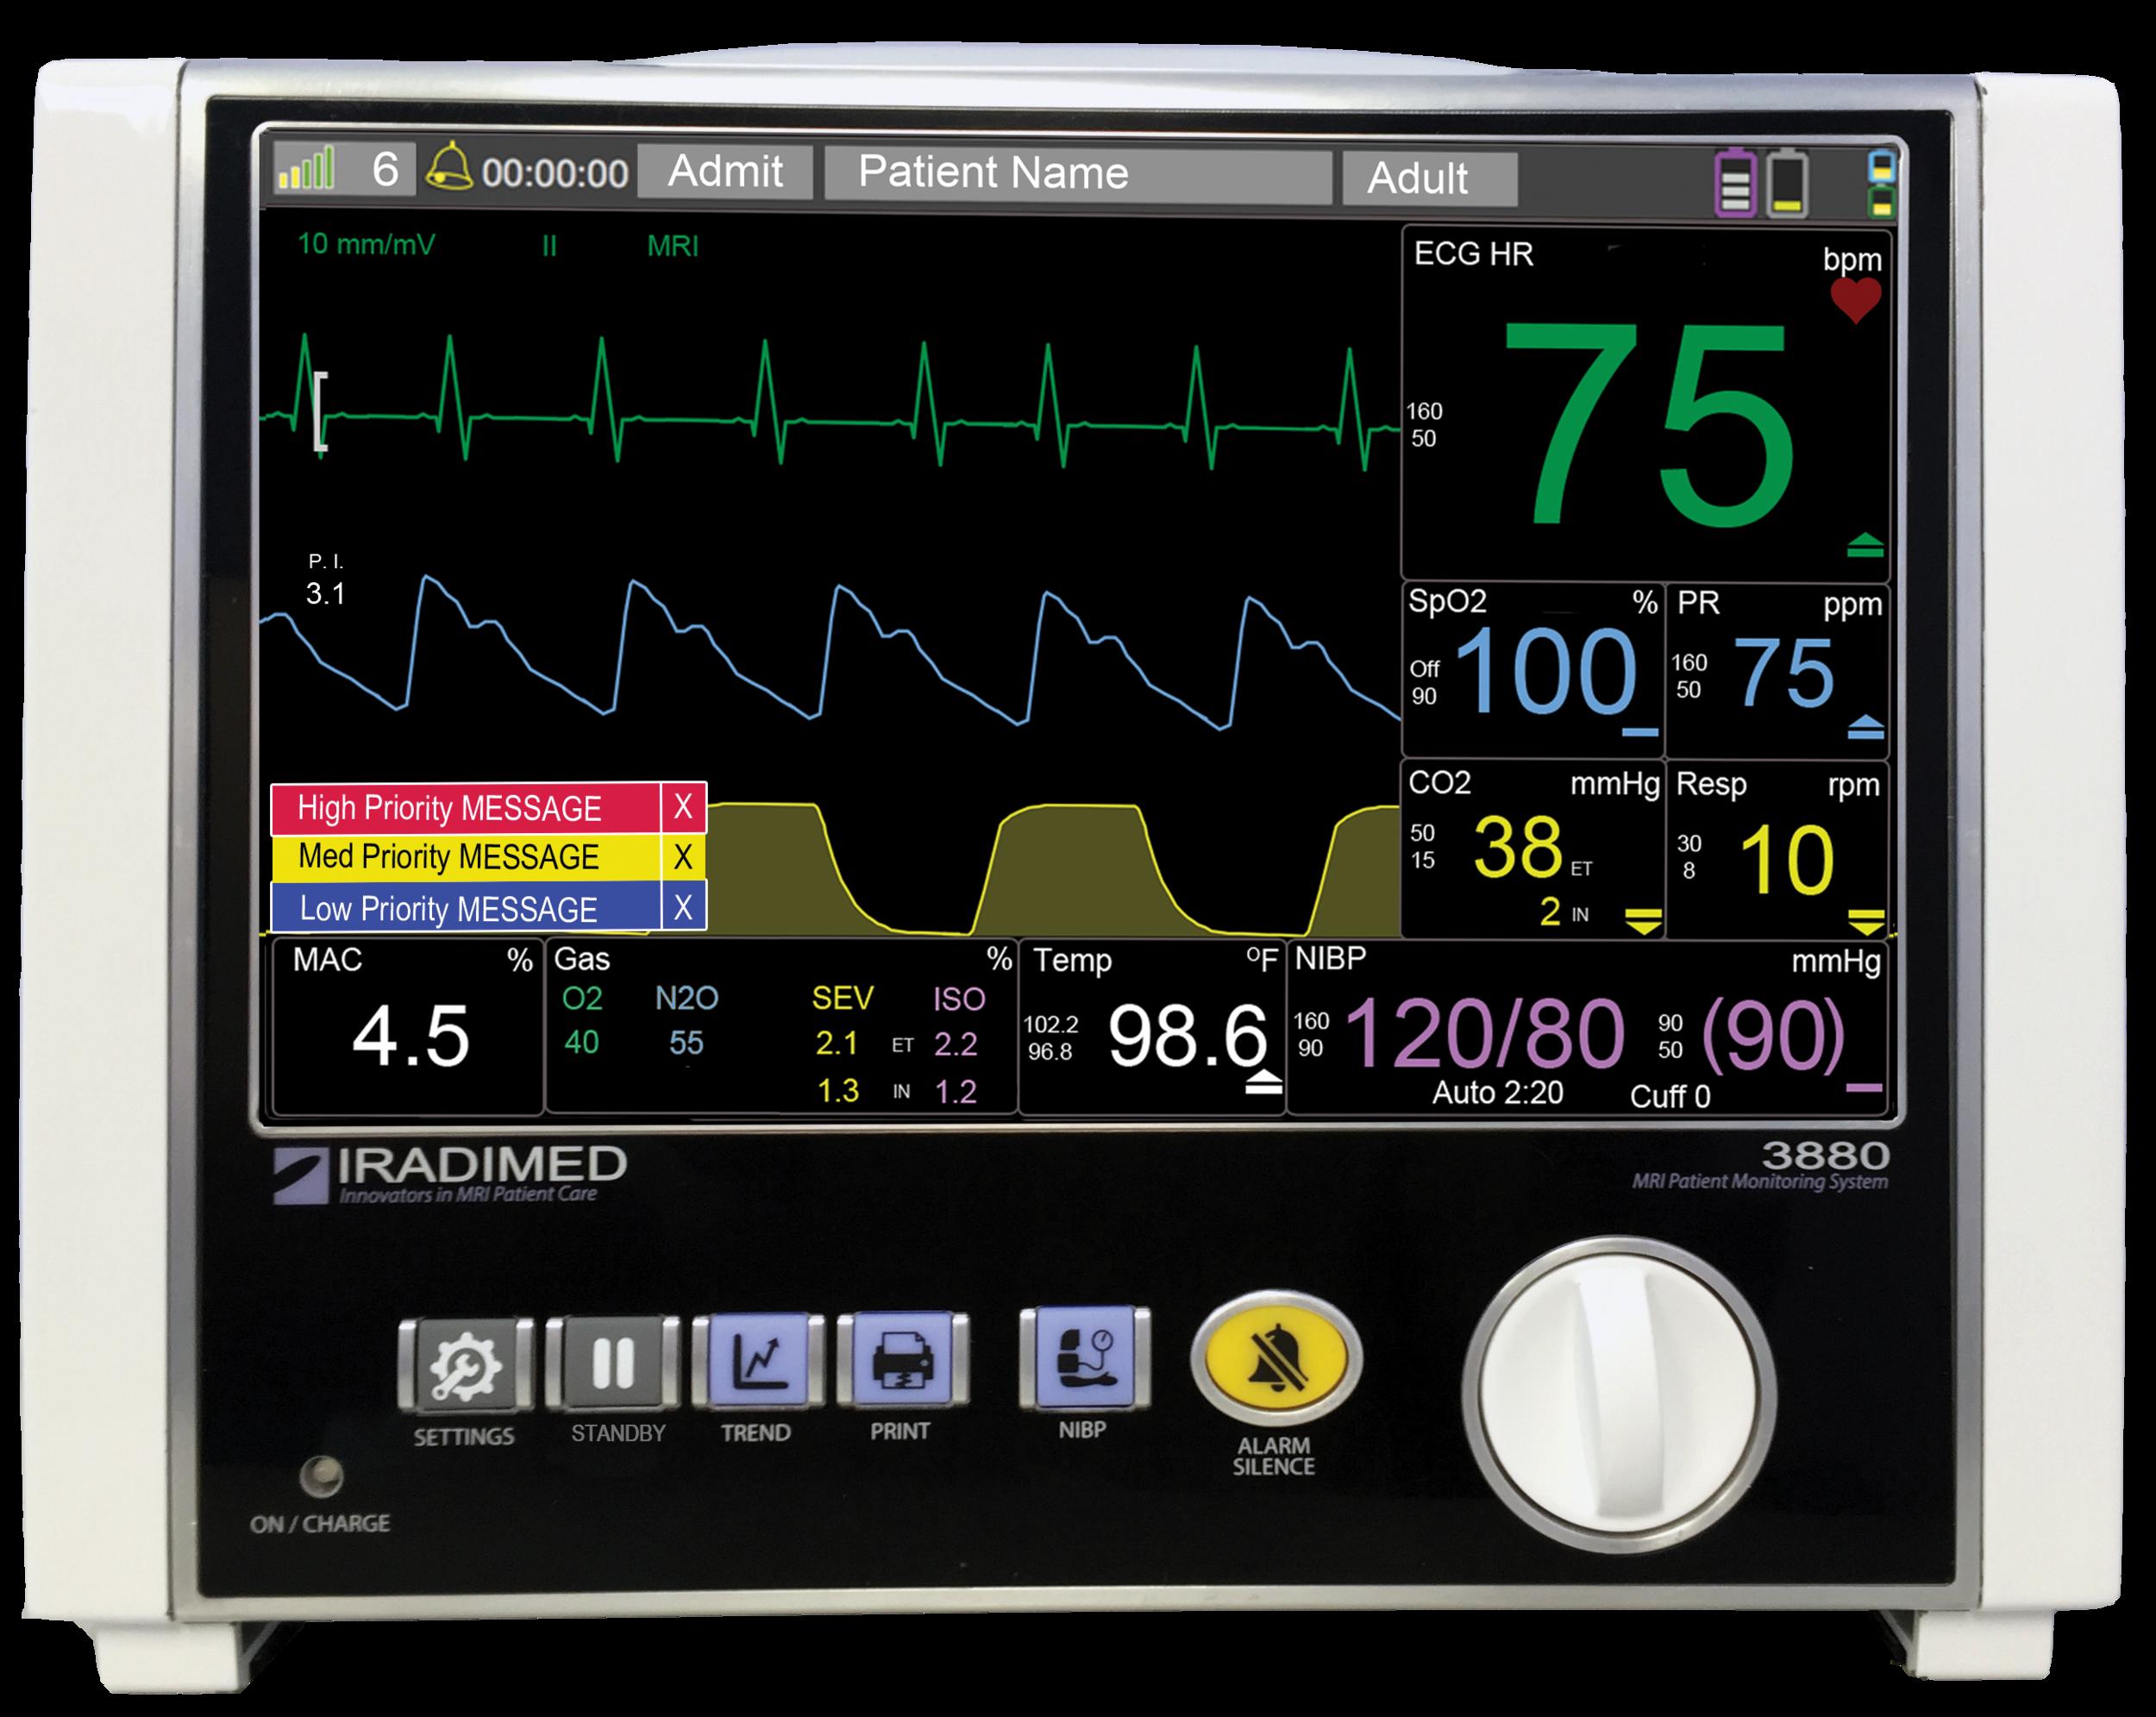 3880 MRI Patient Monitor — IRadimed